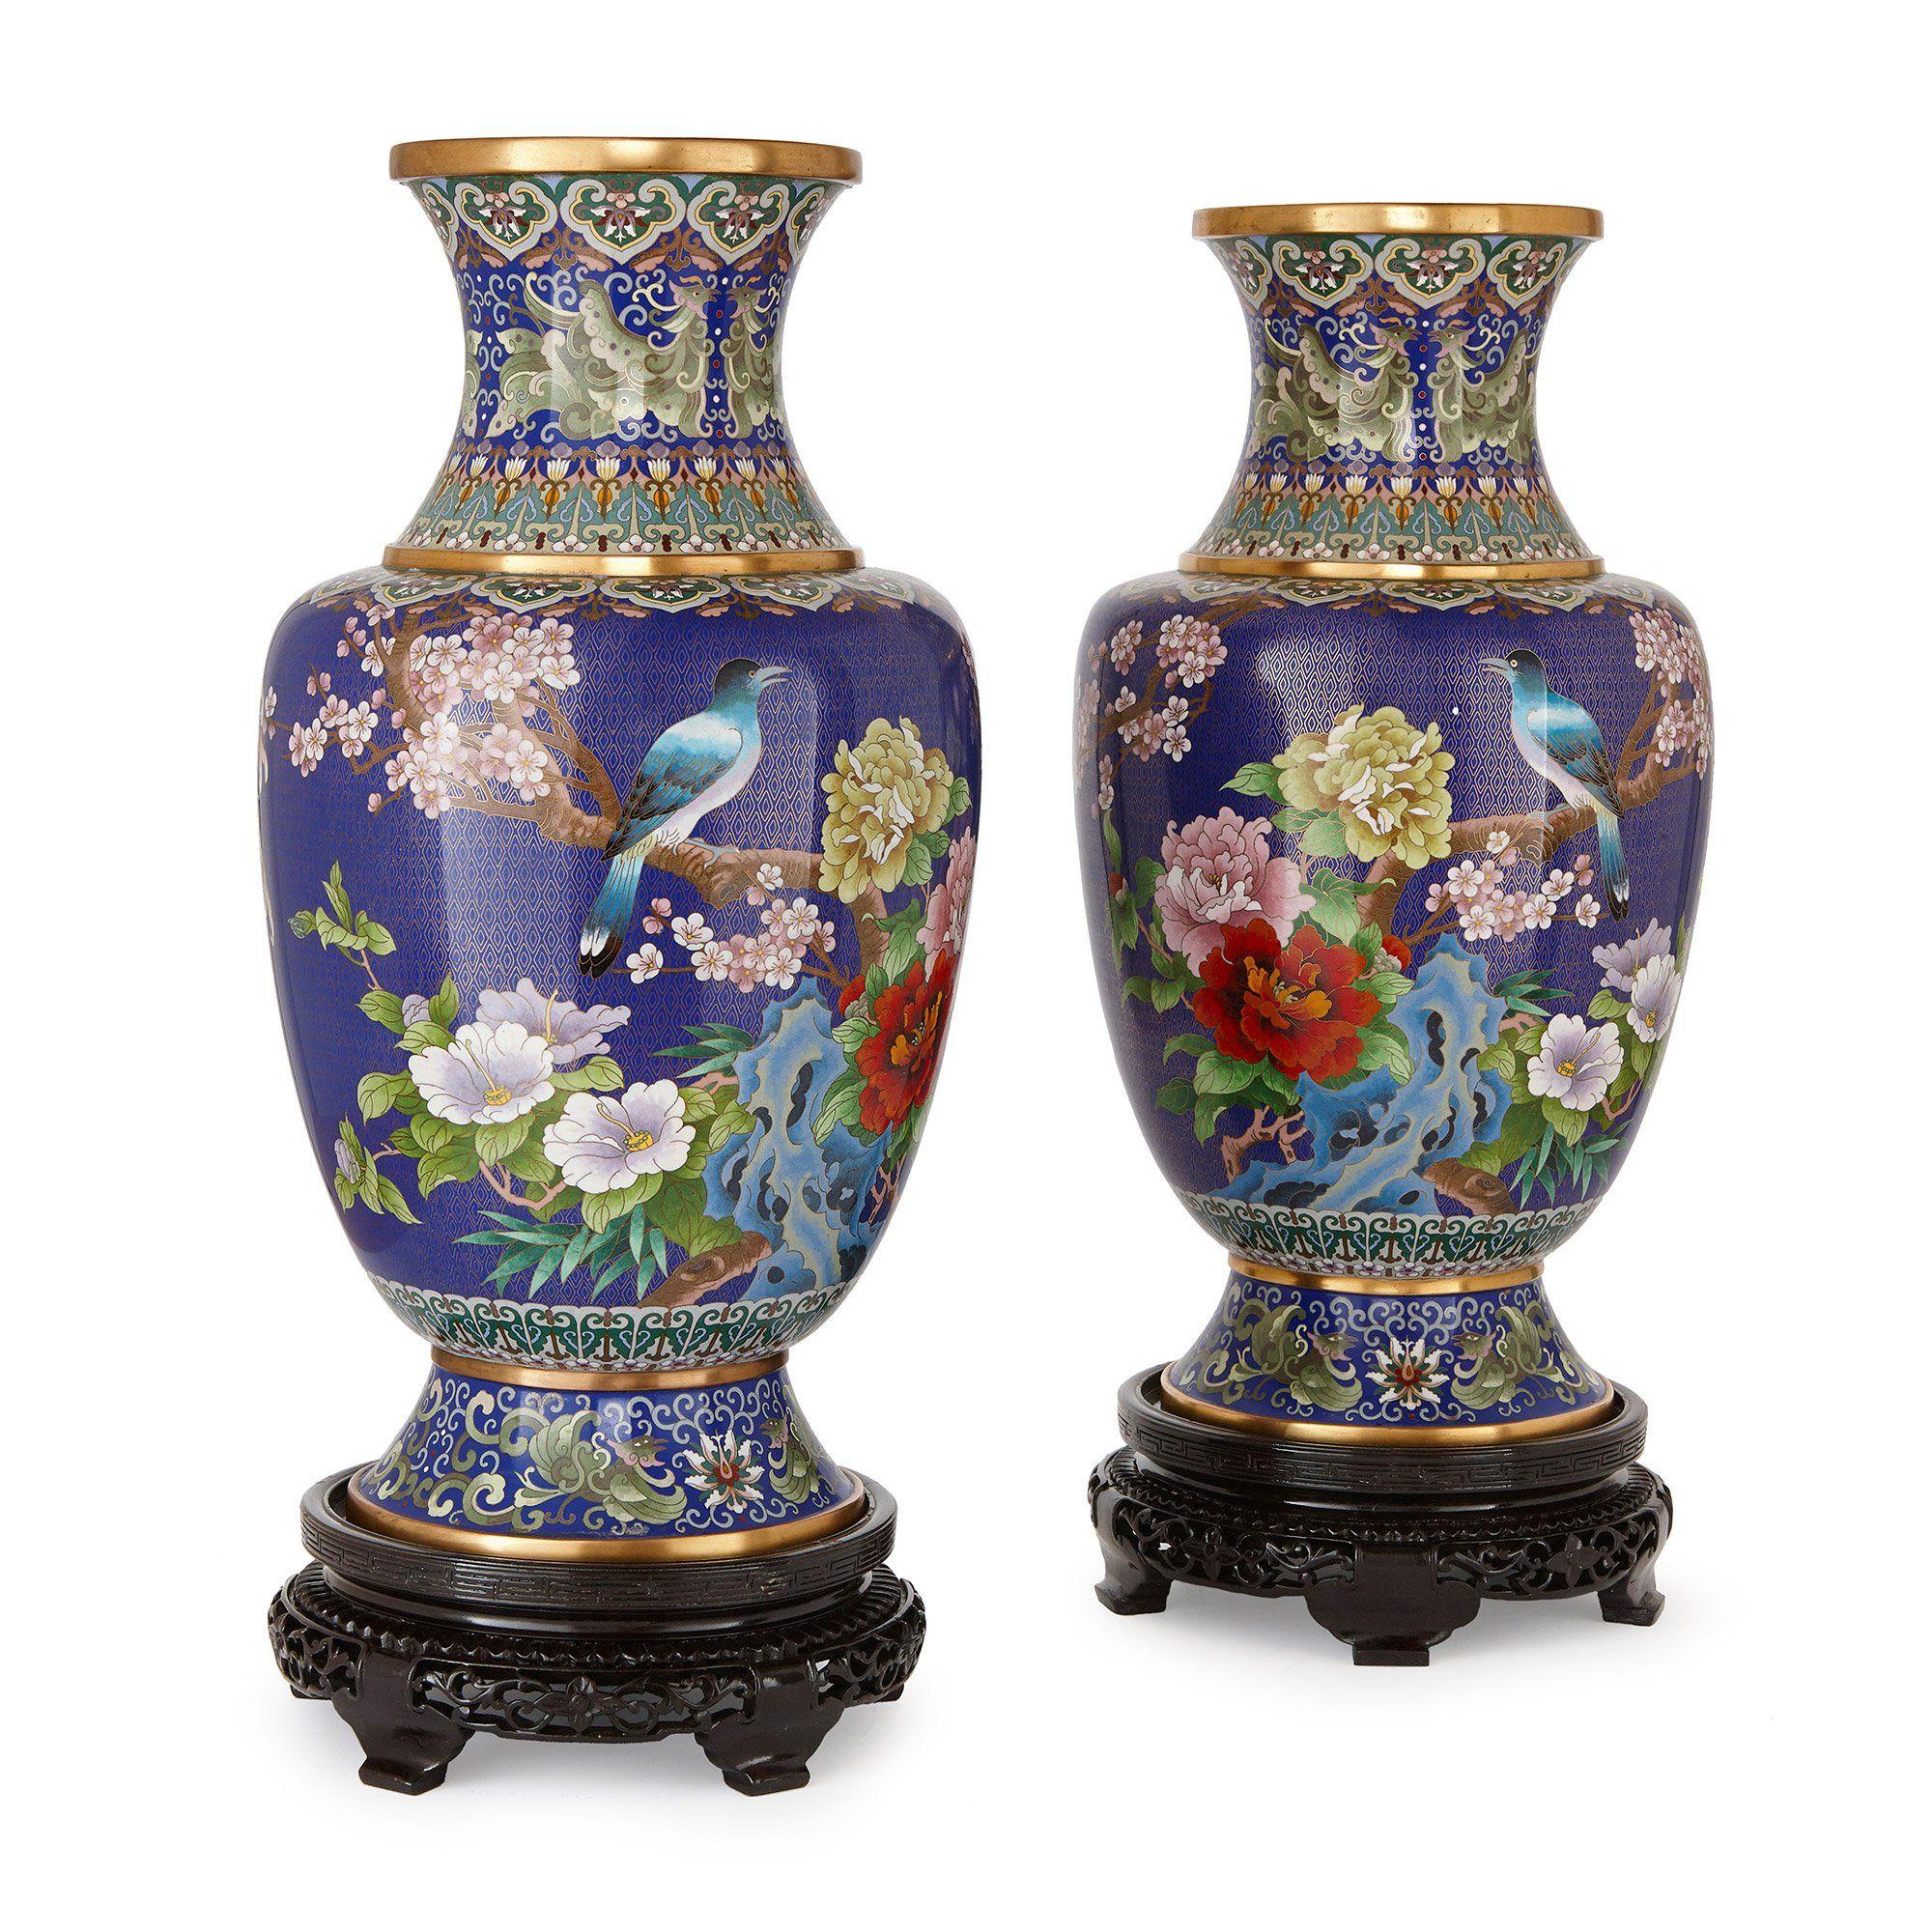 Pair of large Chinese cloisonn enamel vases on wooden